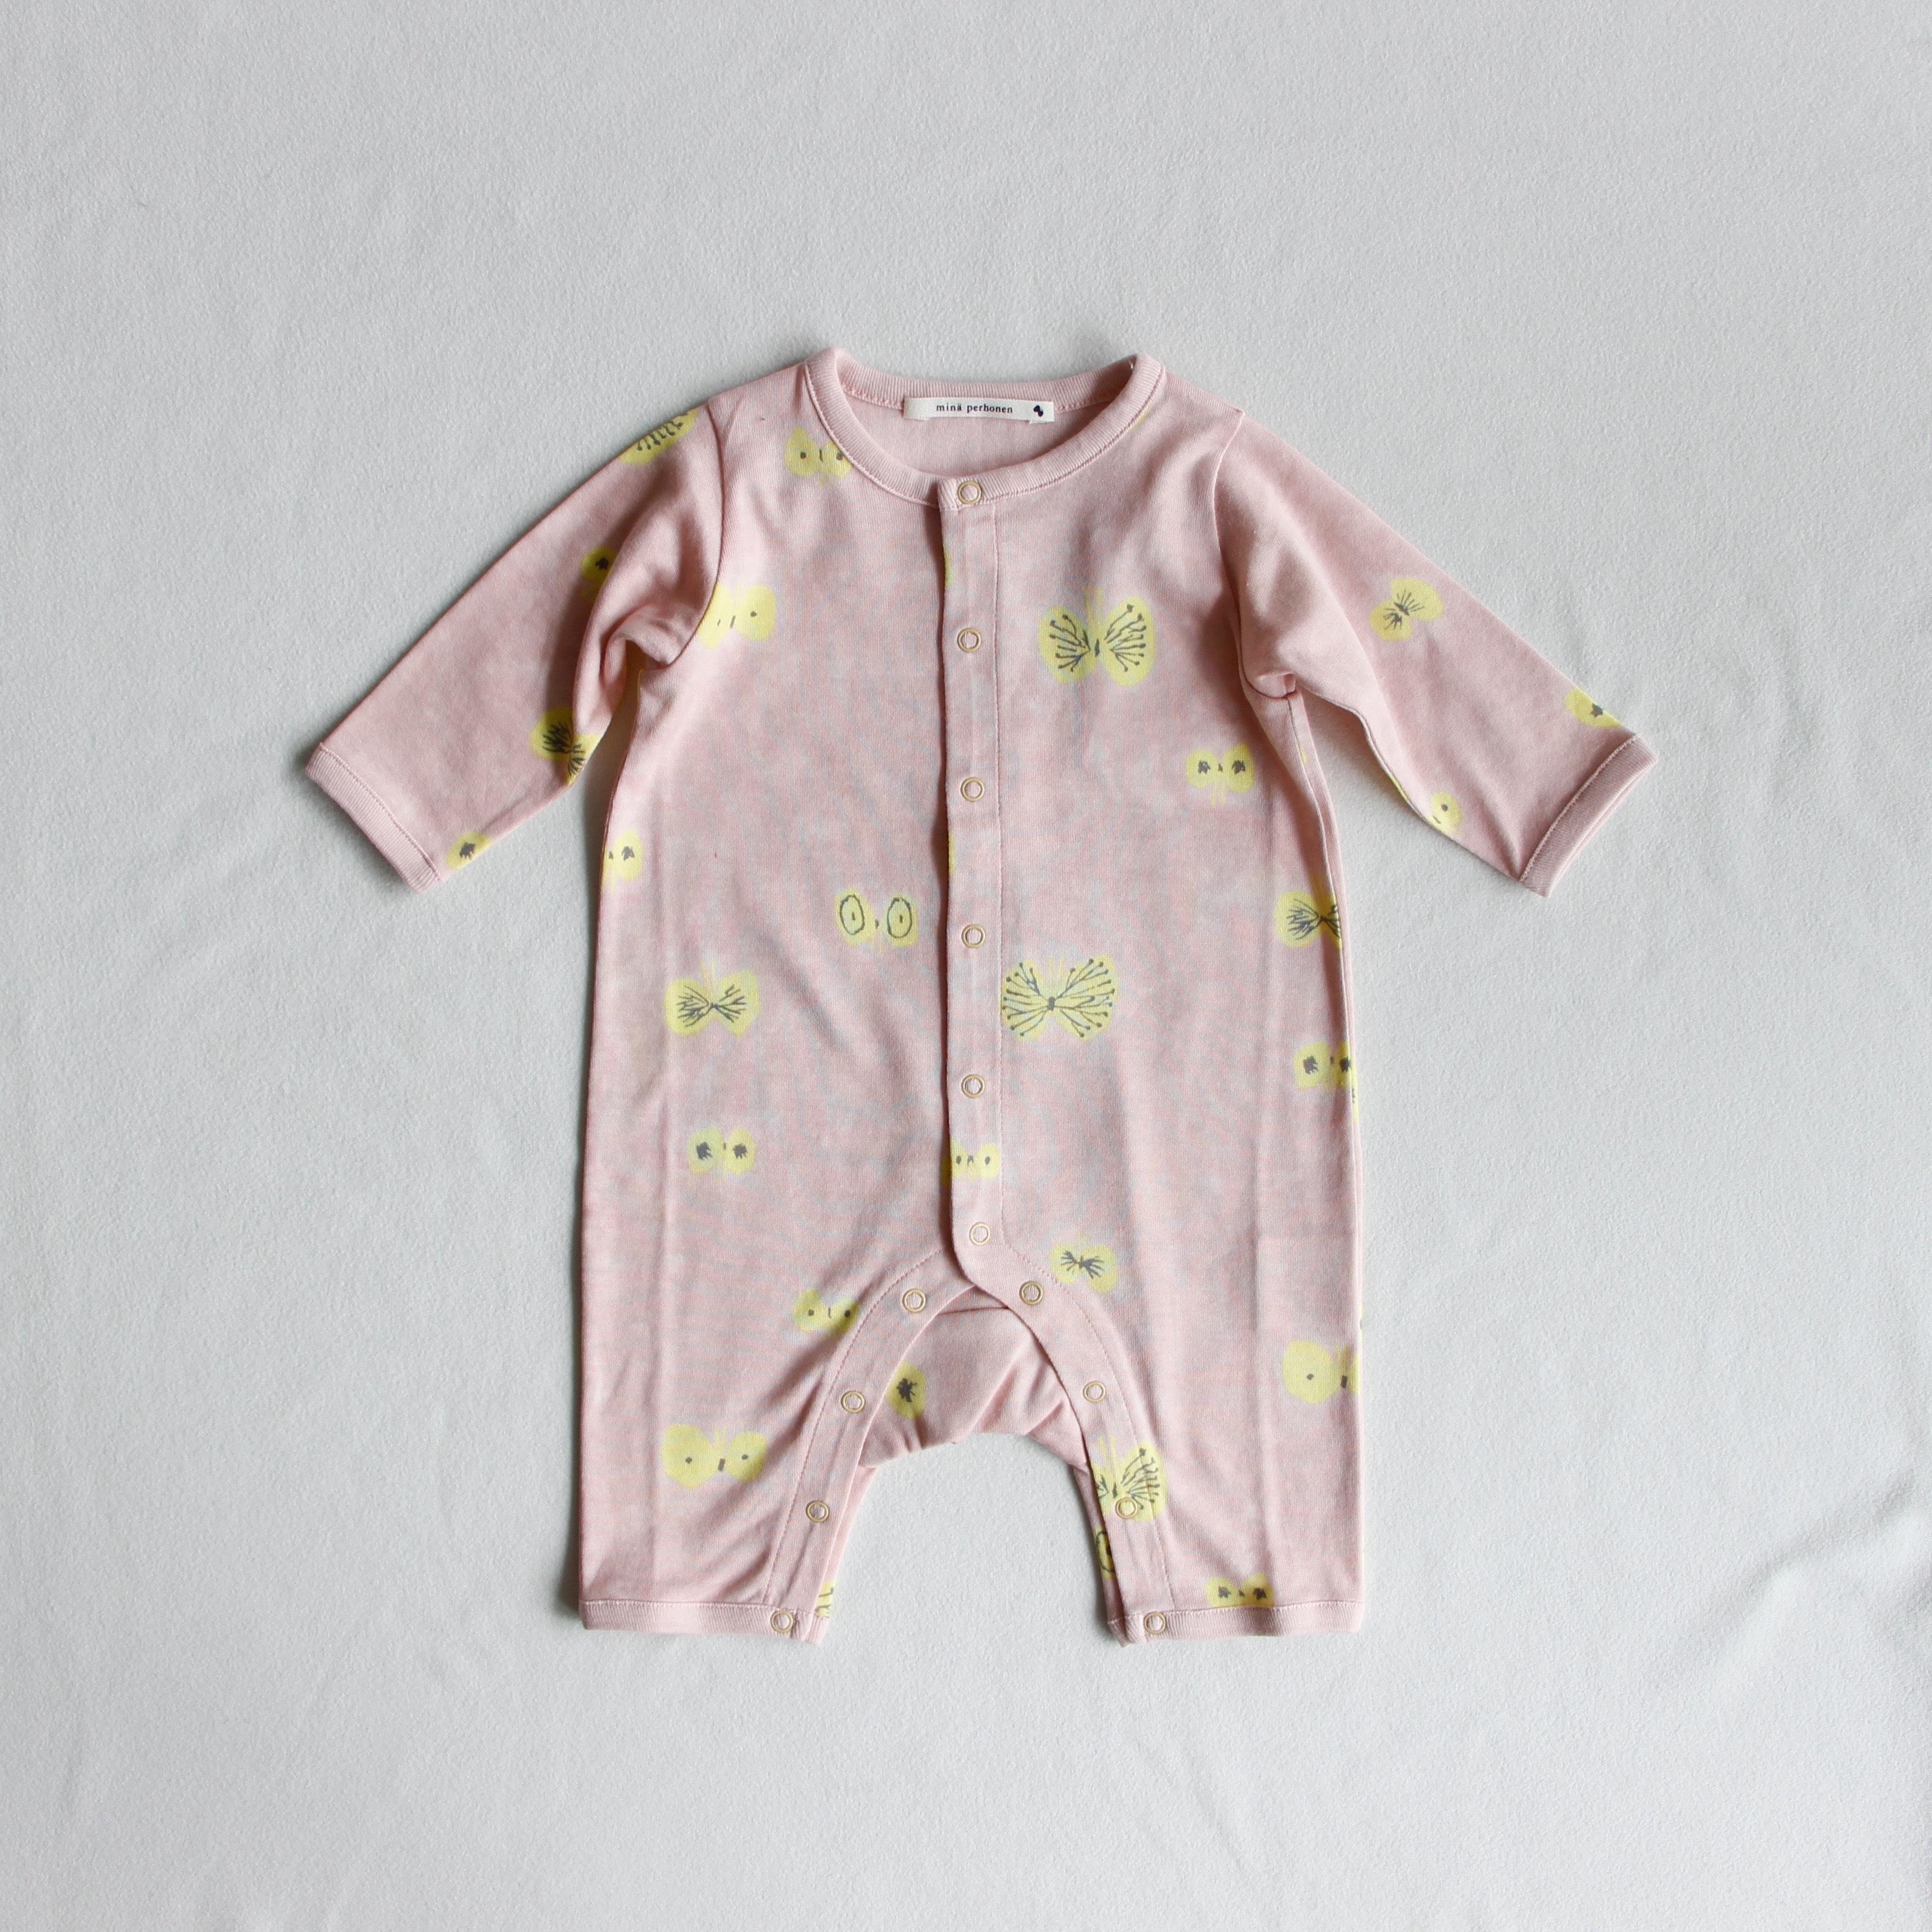 《mina perhonen》hana hane ロンパース / light pink